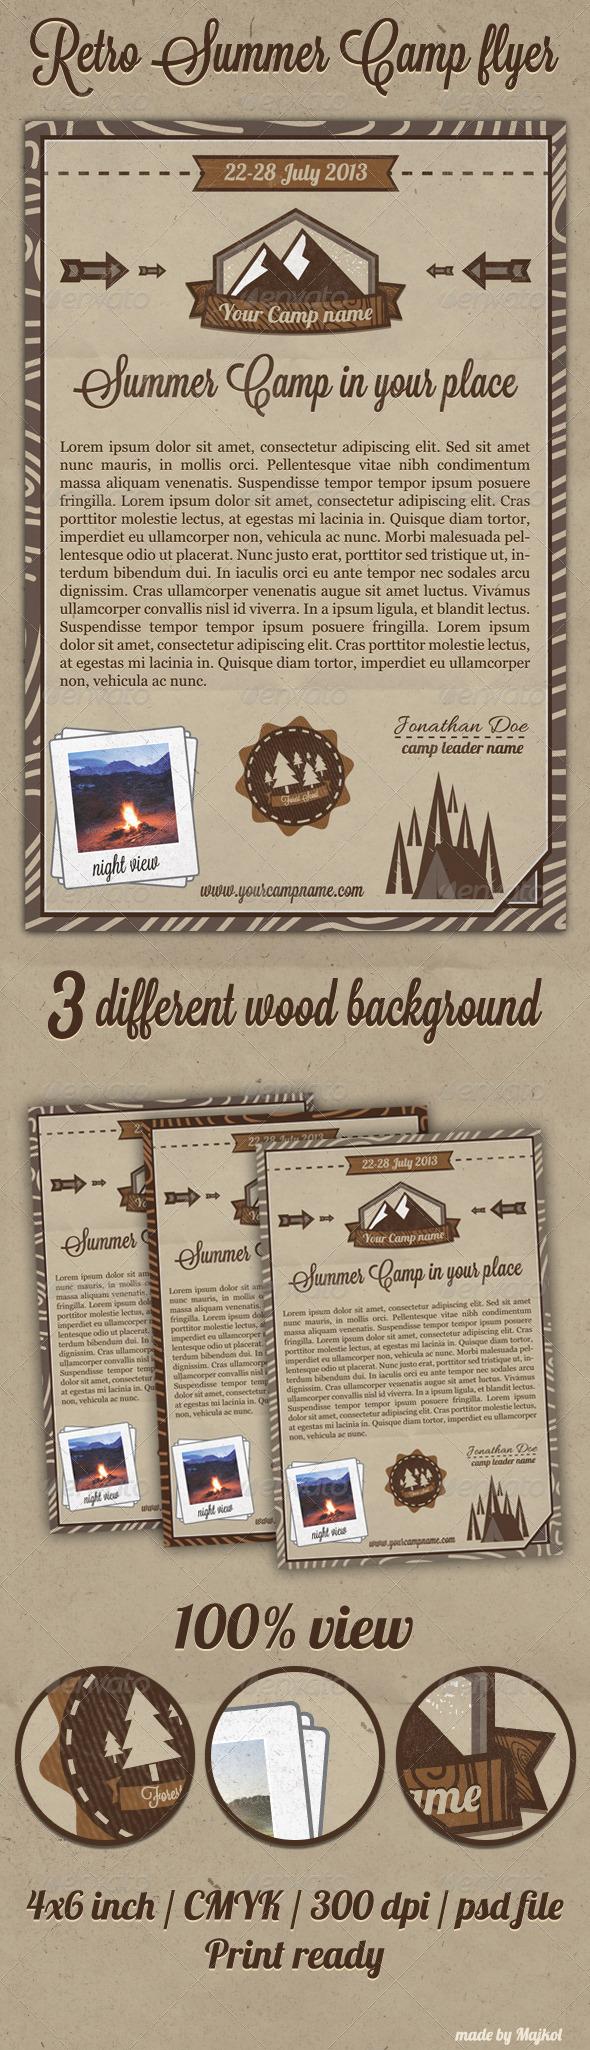 GraphicRiver Retro Summer Camp Flyer 4592539